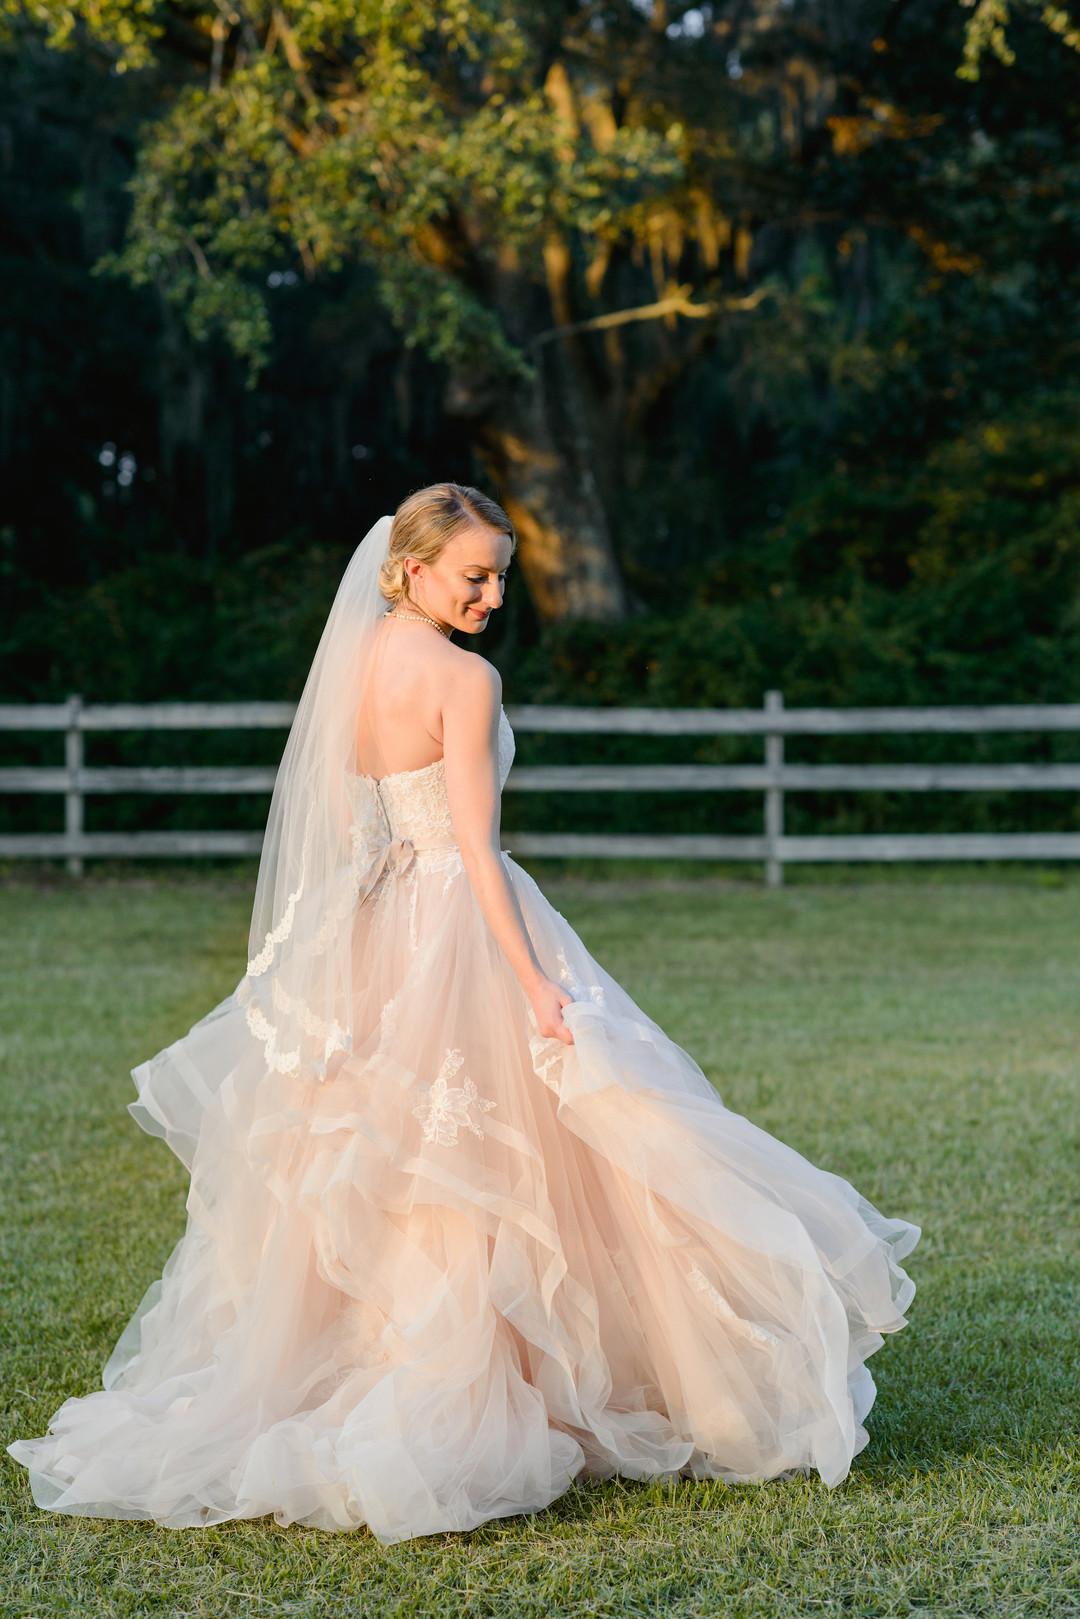 old-wide-awake-plantation-wedding-13.JPG